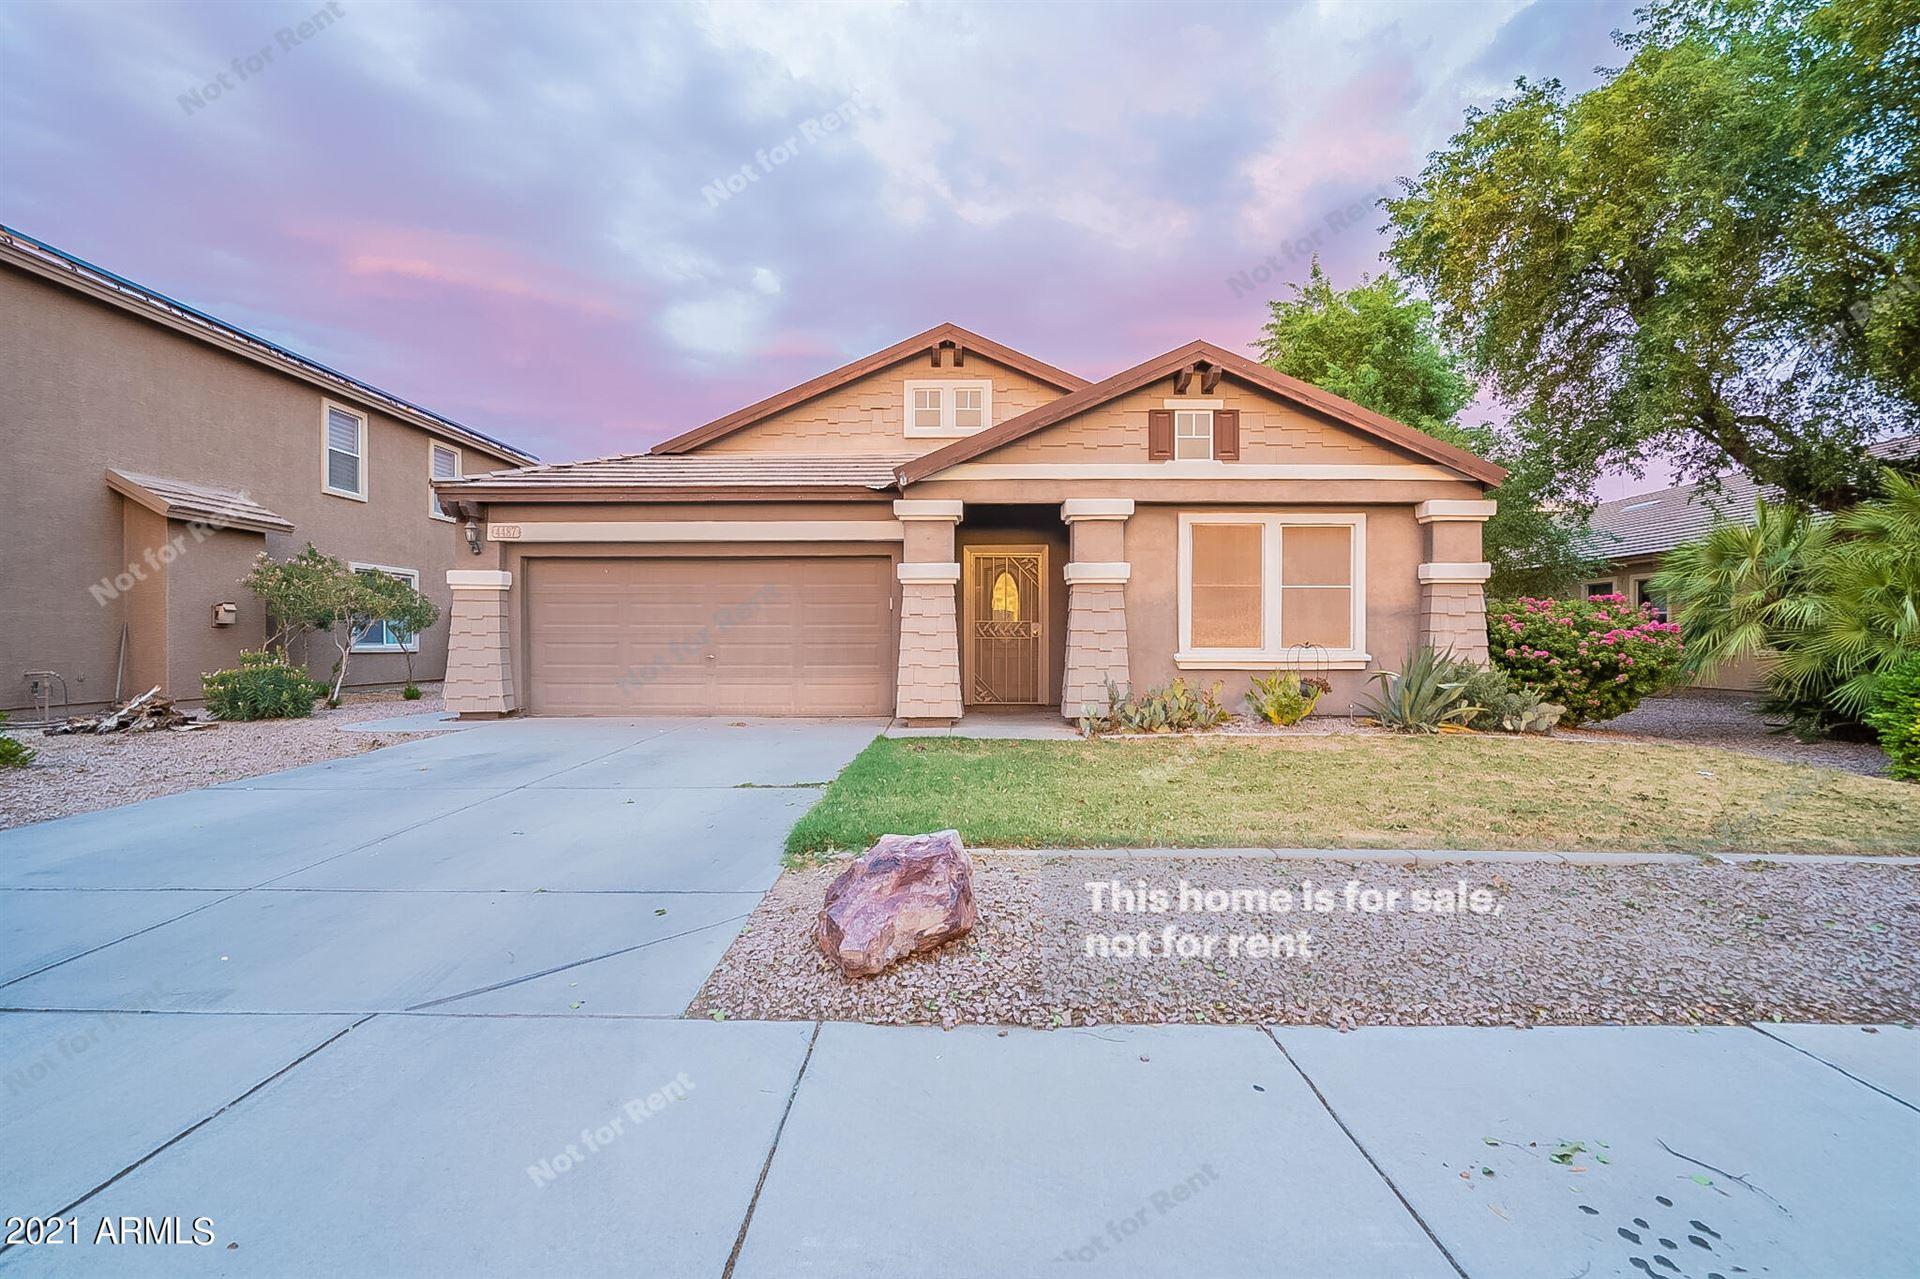 4487 S JOSHUA TREE Lane, Gilbert, AZ 85297 - MLS#: 6263283